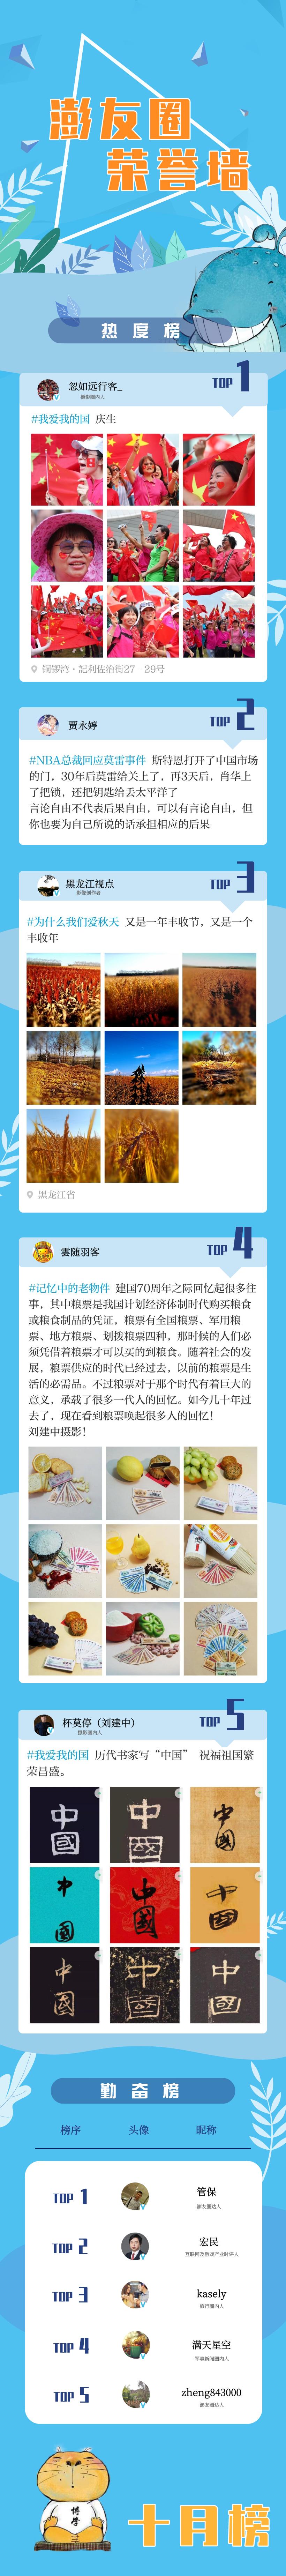 <strong>石磊个人资料澎友圈10月榜发布|从</strong>